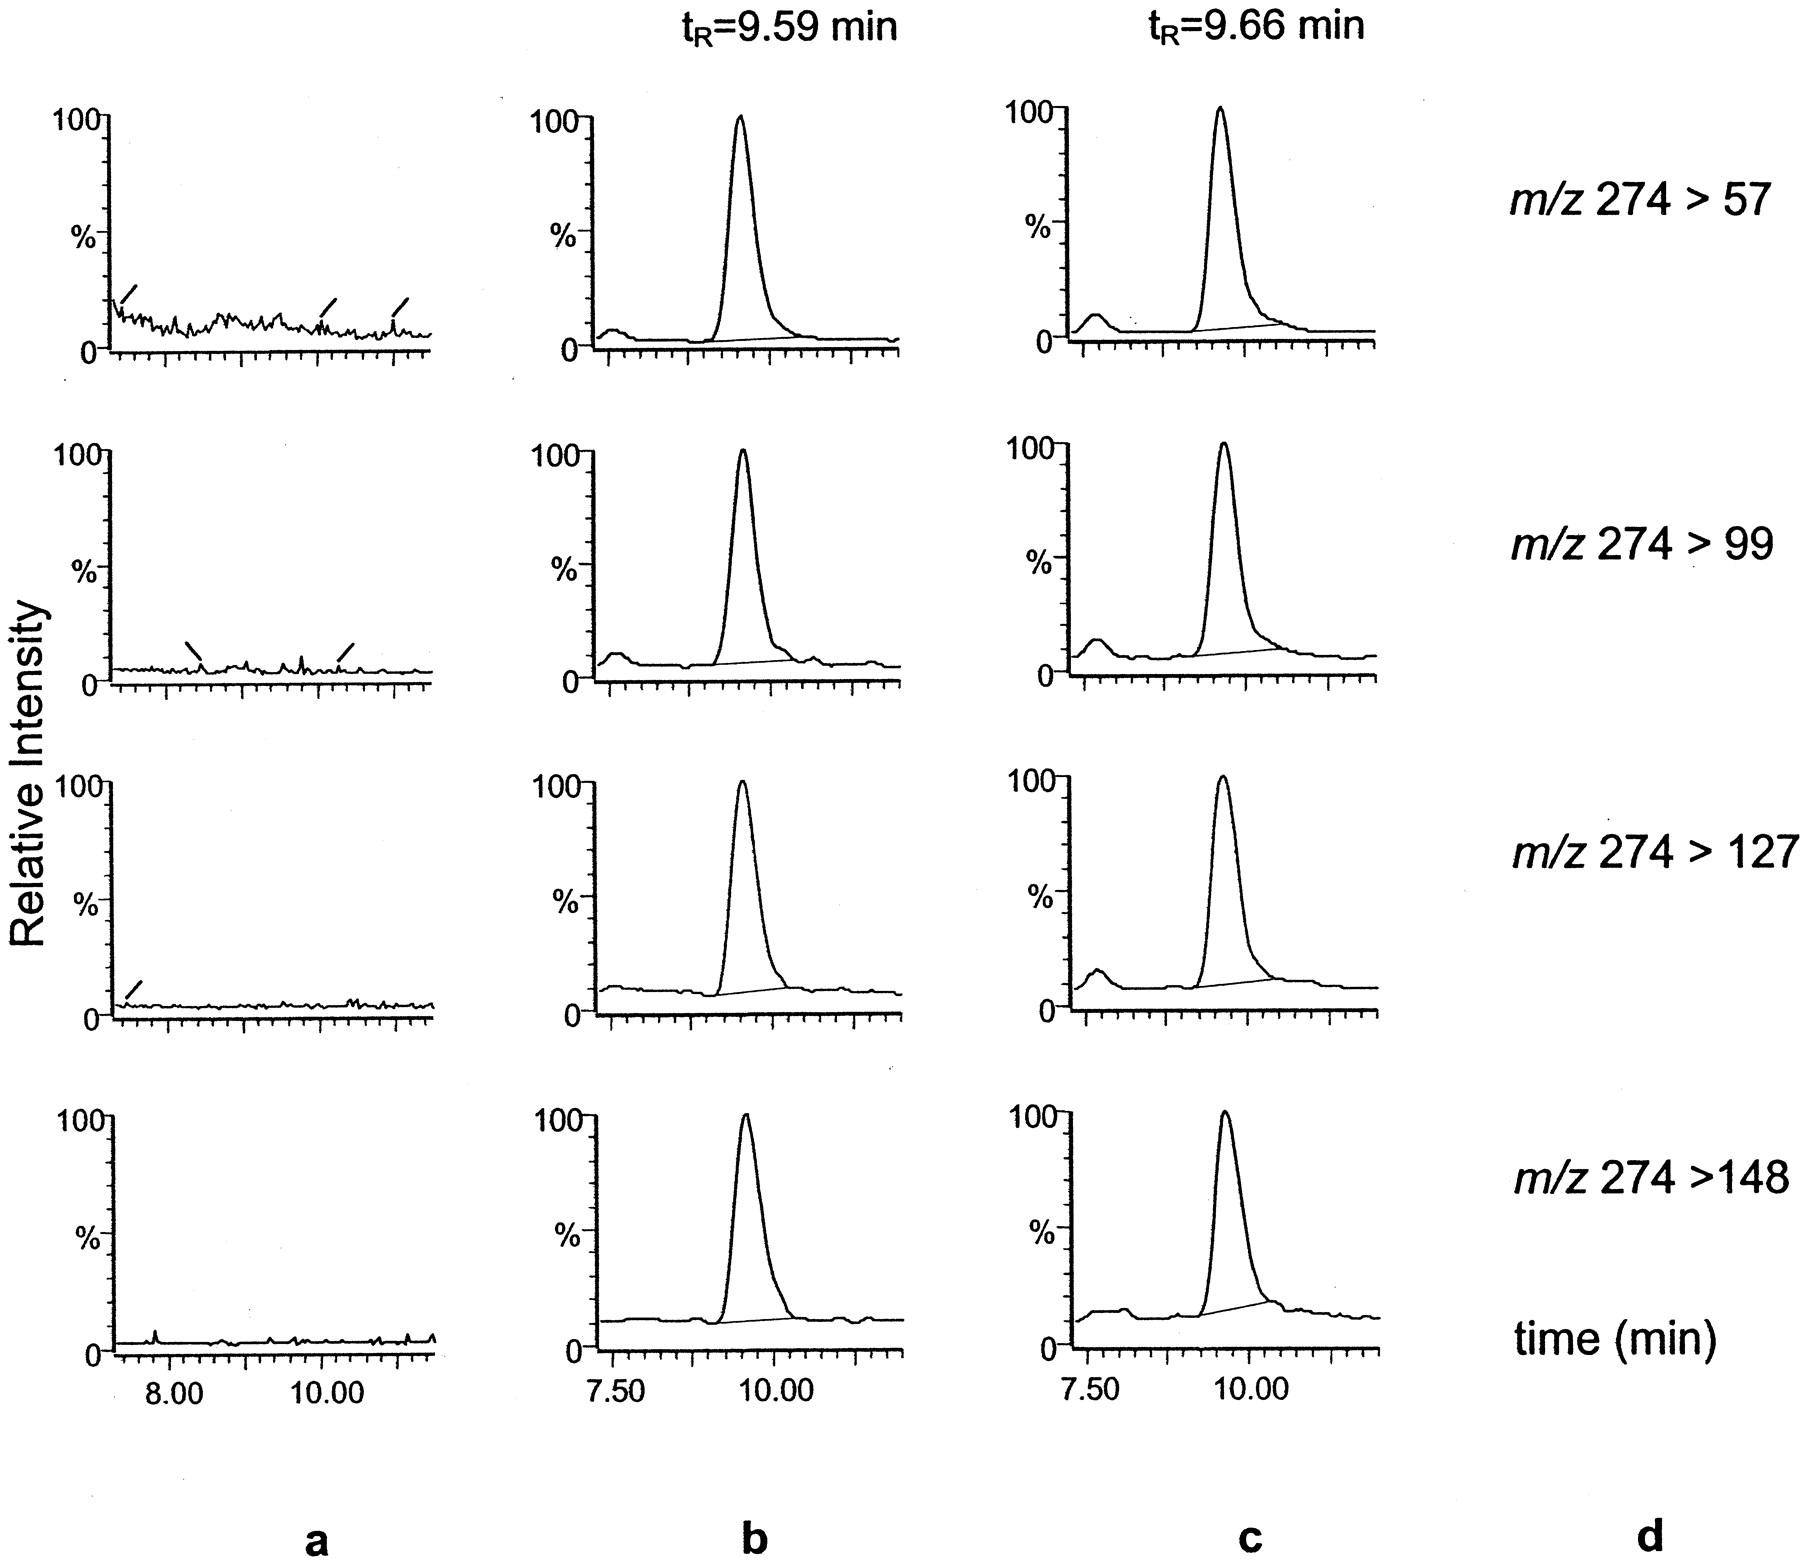 Amino Acid Conjugates: Metabolites of 2-Propylpentanoic Acid